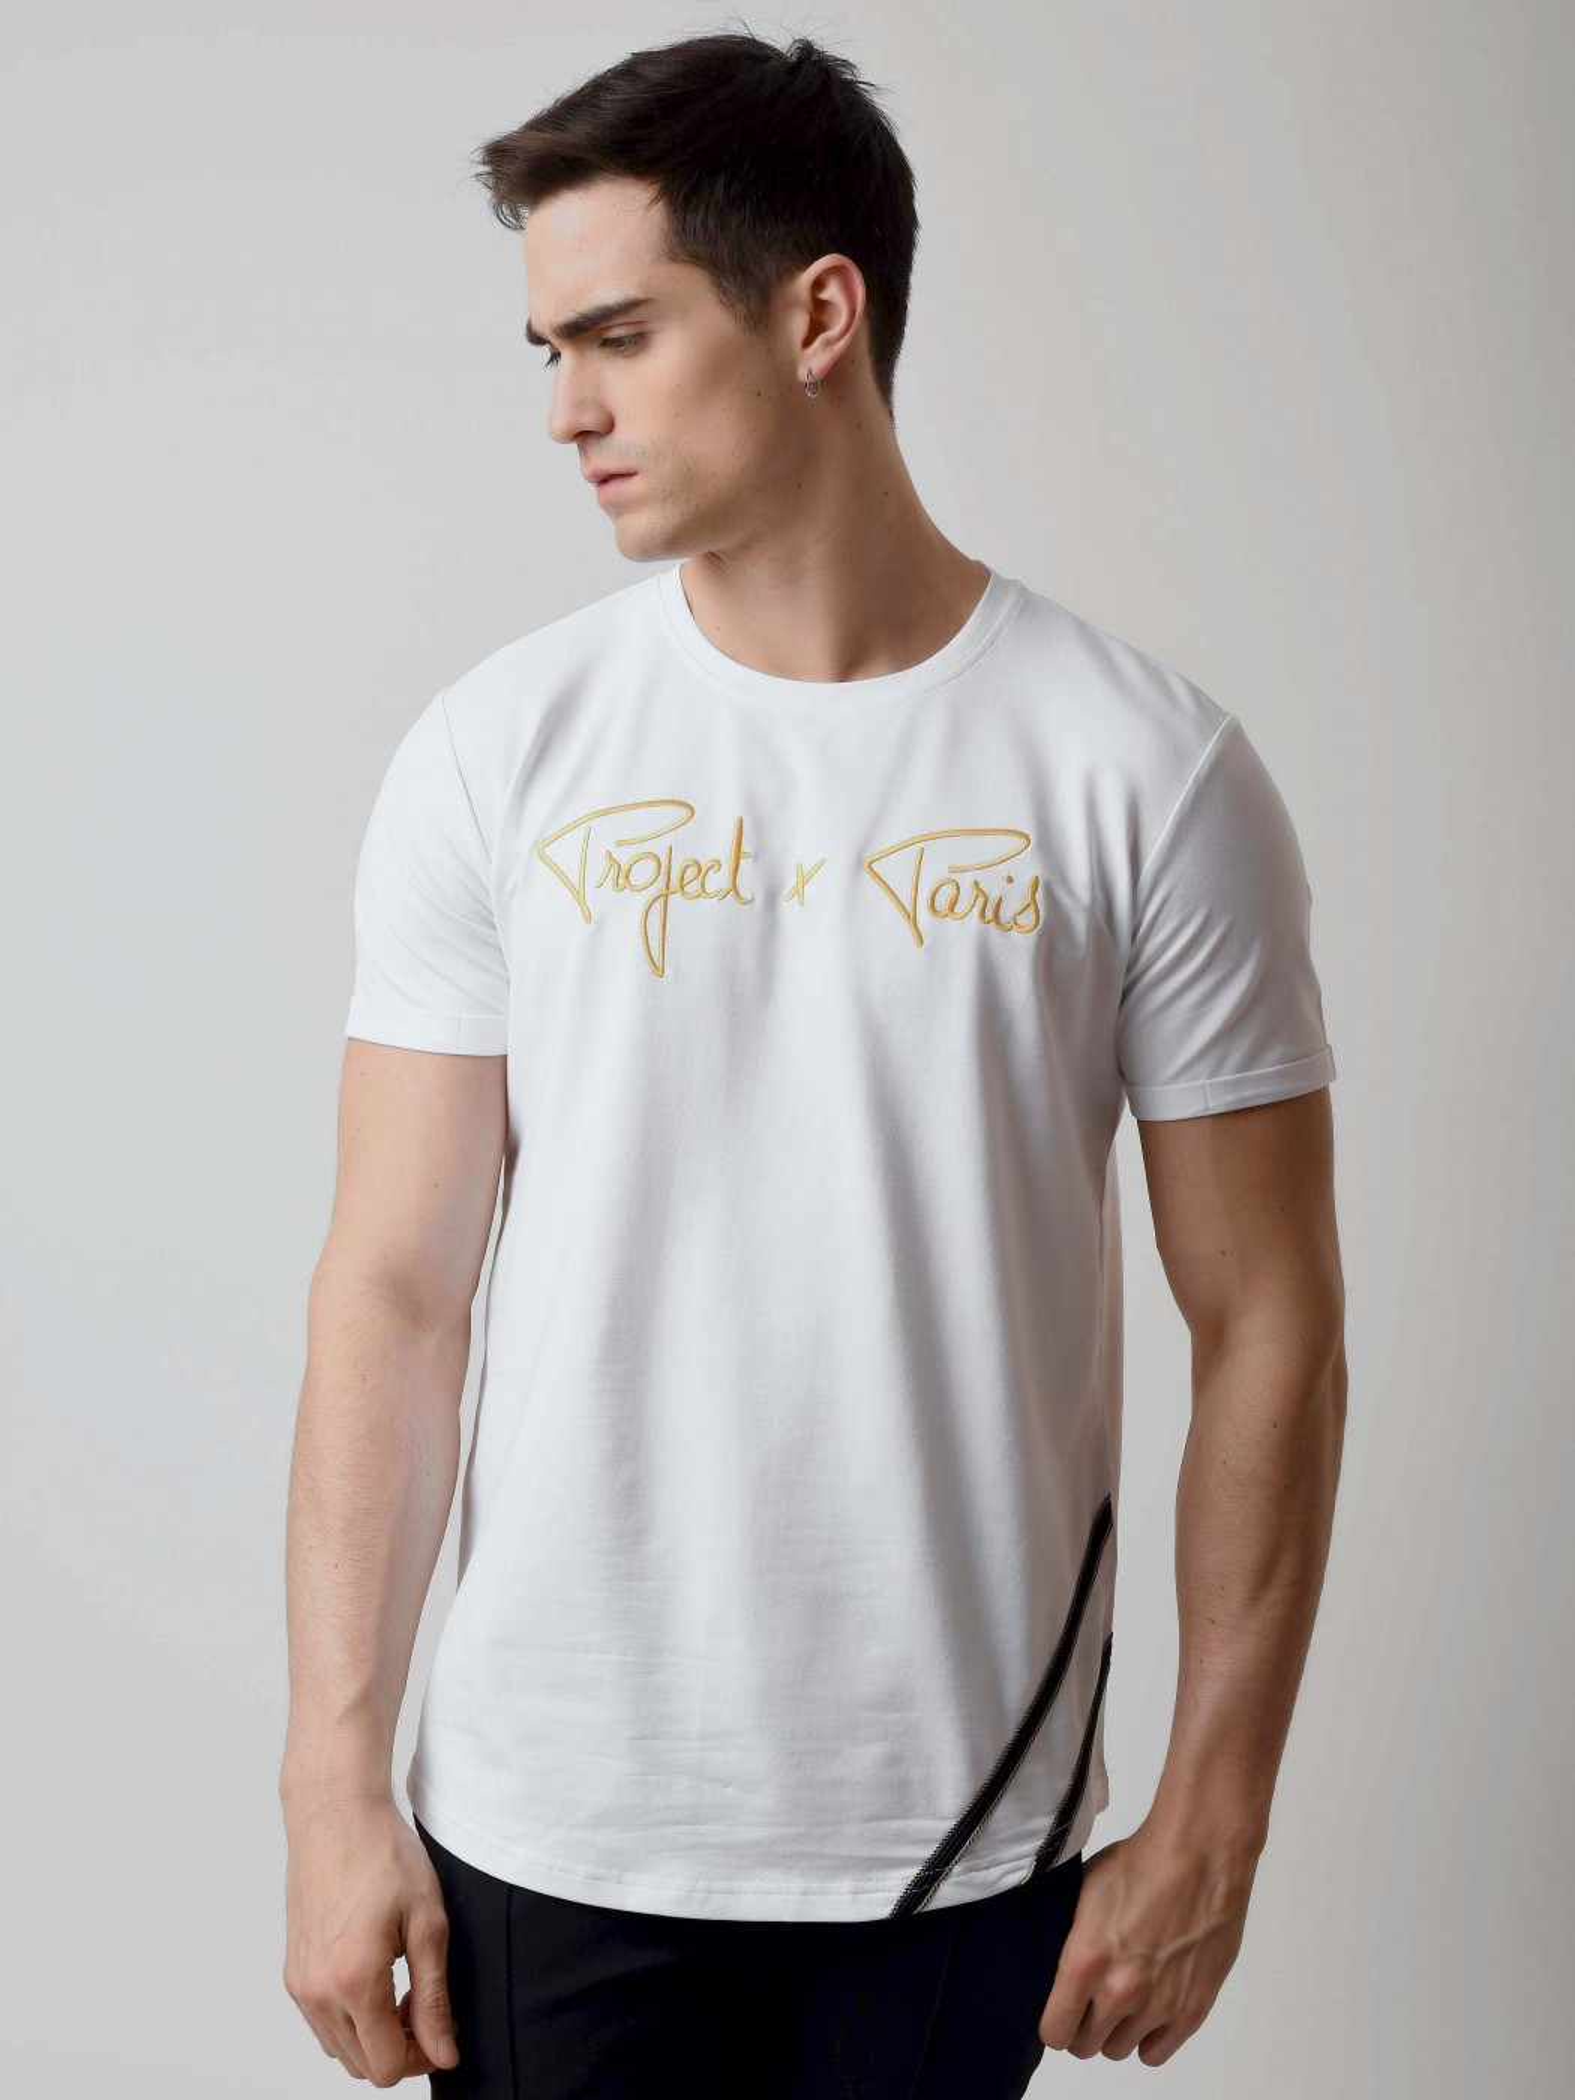 t shirt broderie logo gold homme project x paris. Black Bedroom Furniture Sets. Home Design Ideas